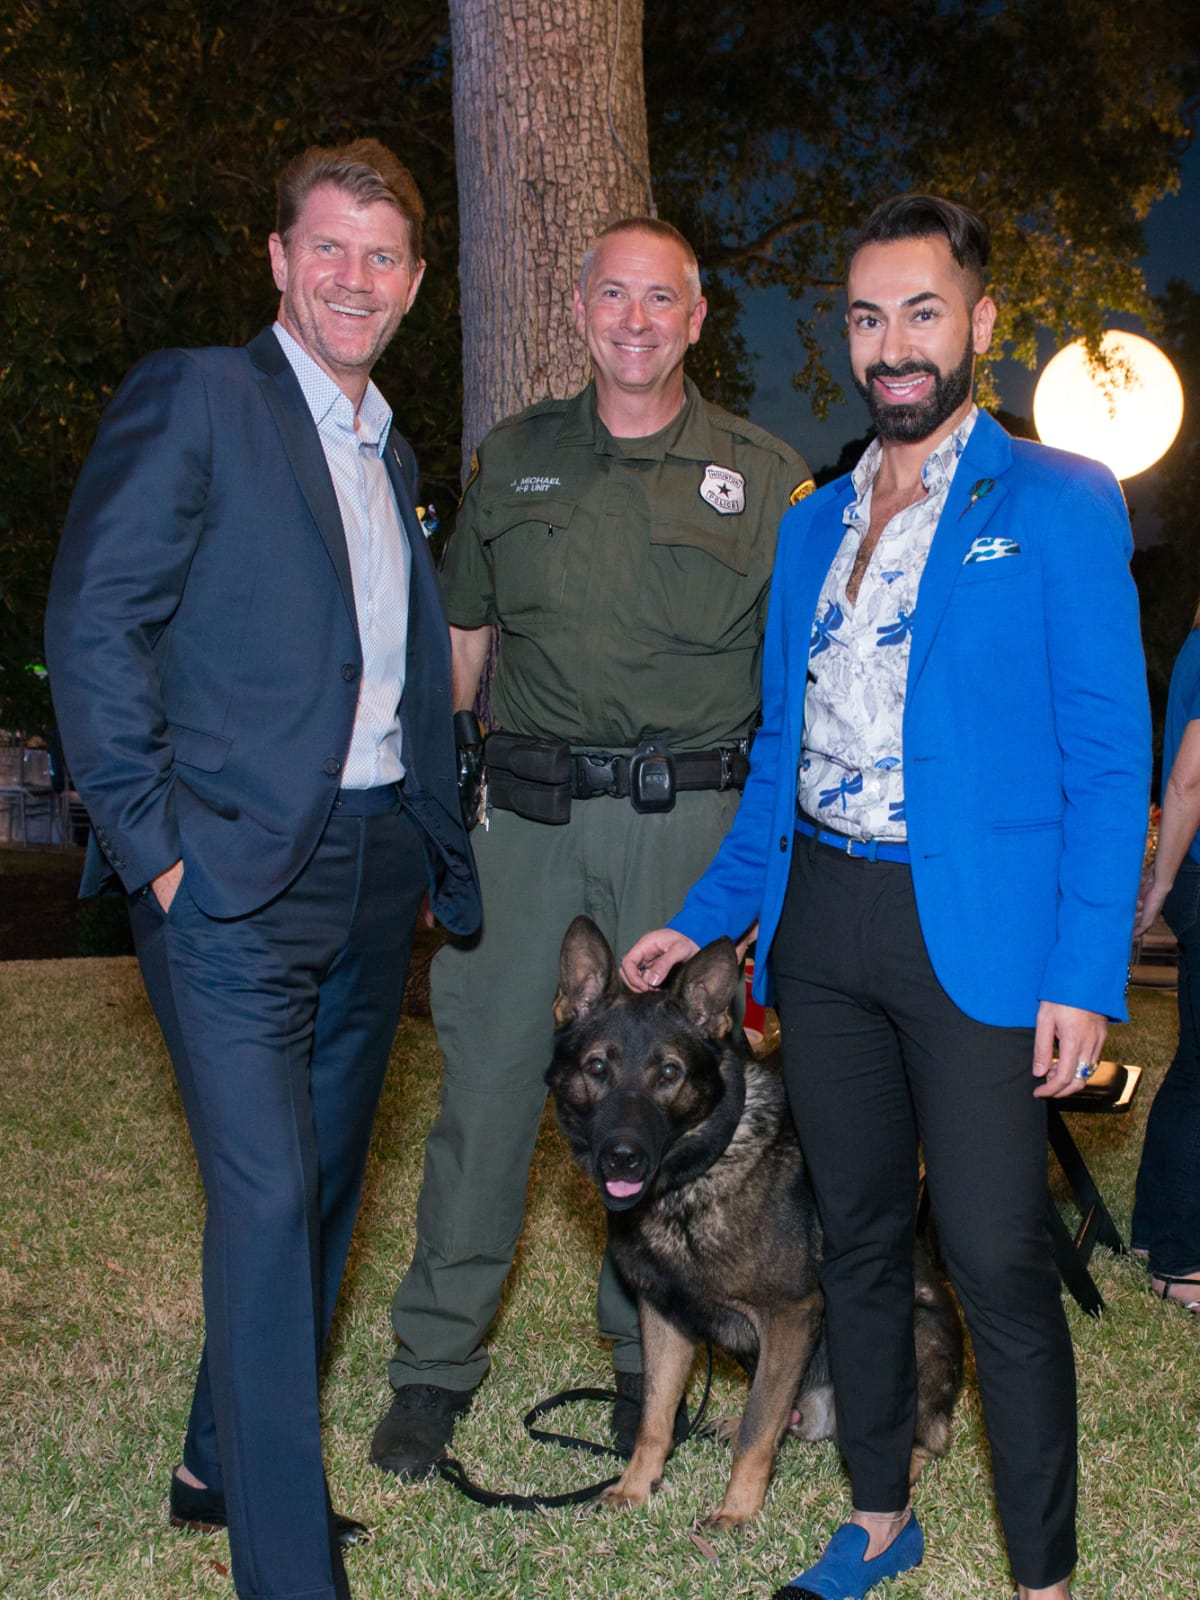 Houston, True Blue Gala, November 2017, Bill Baldwin, officer Jeff Michael with Bullet, Fady Armanious